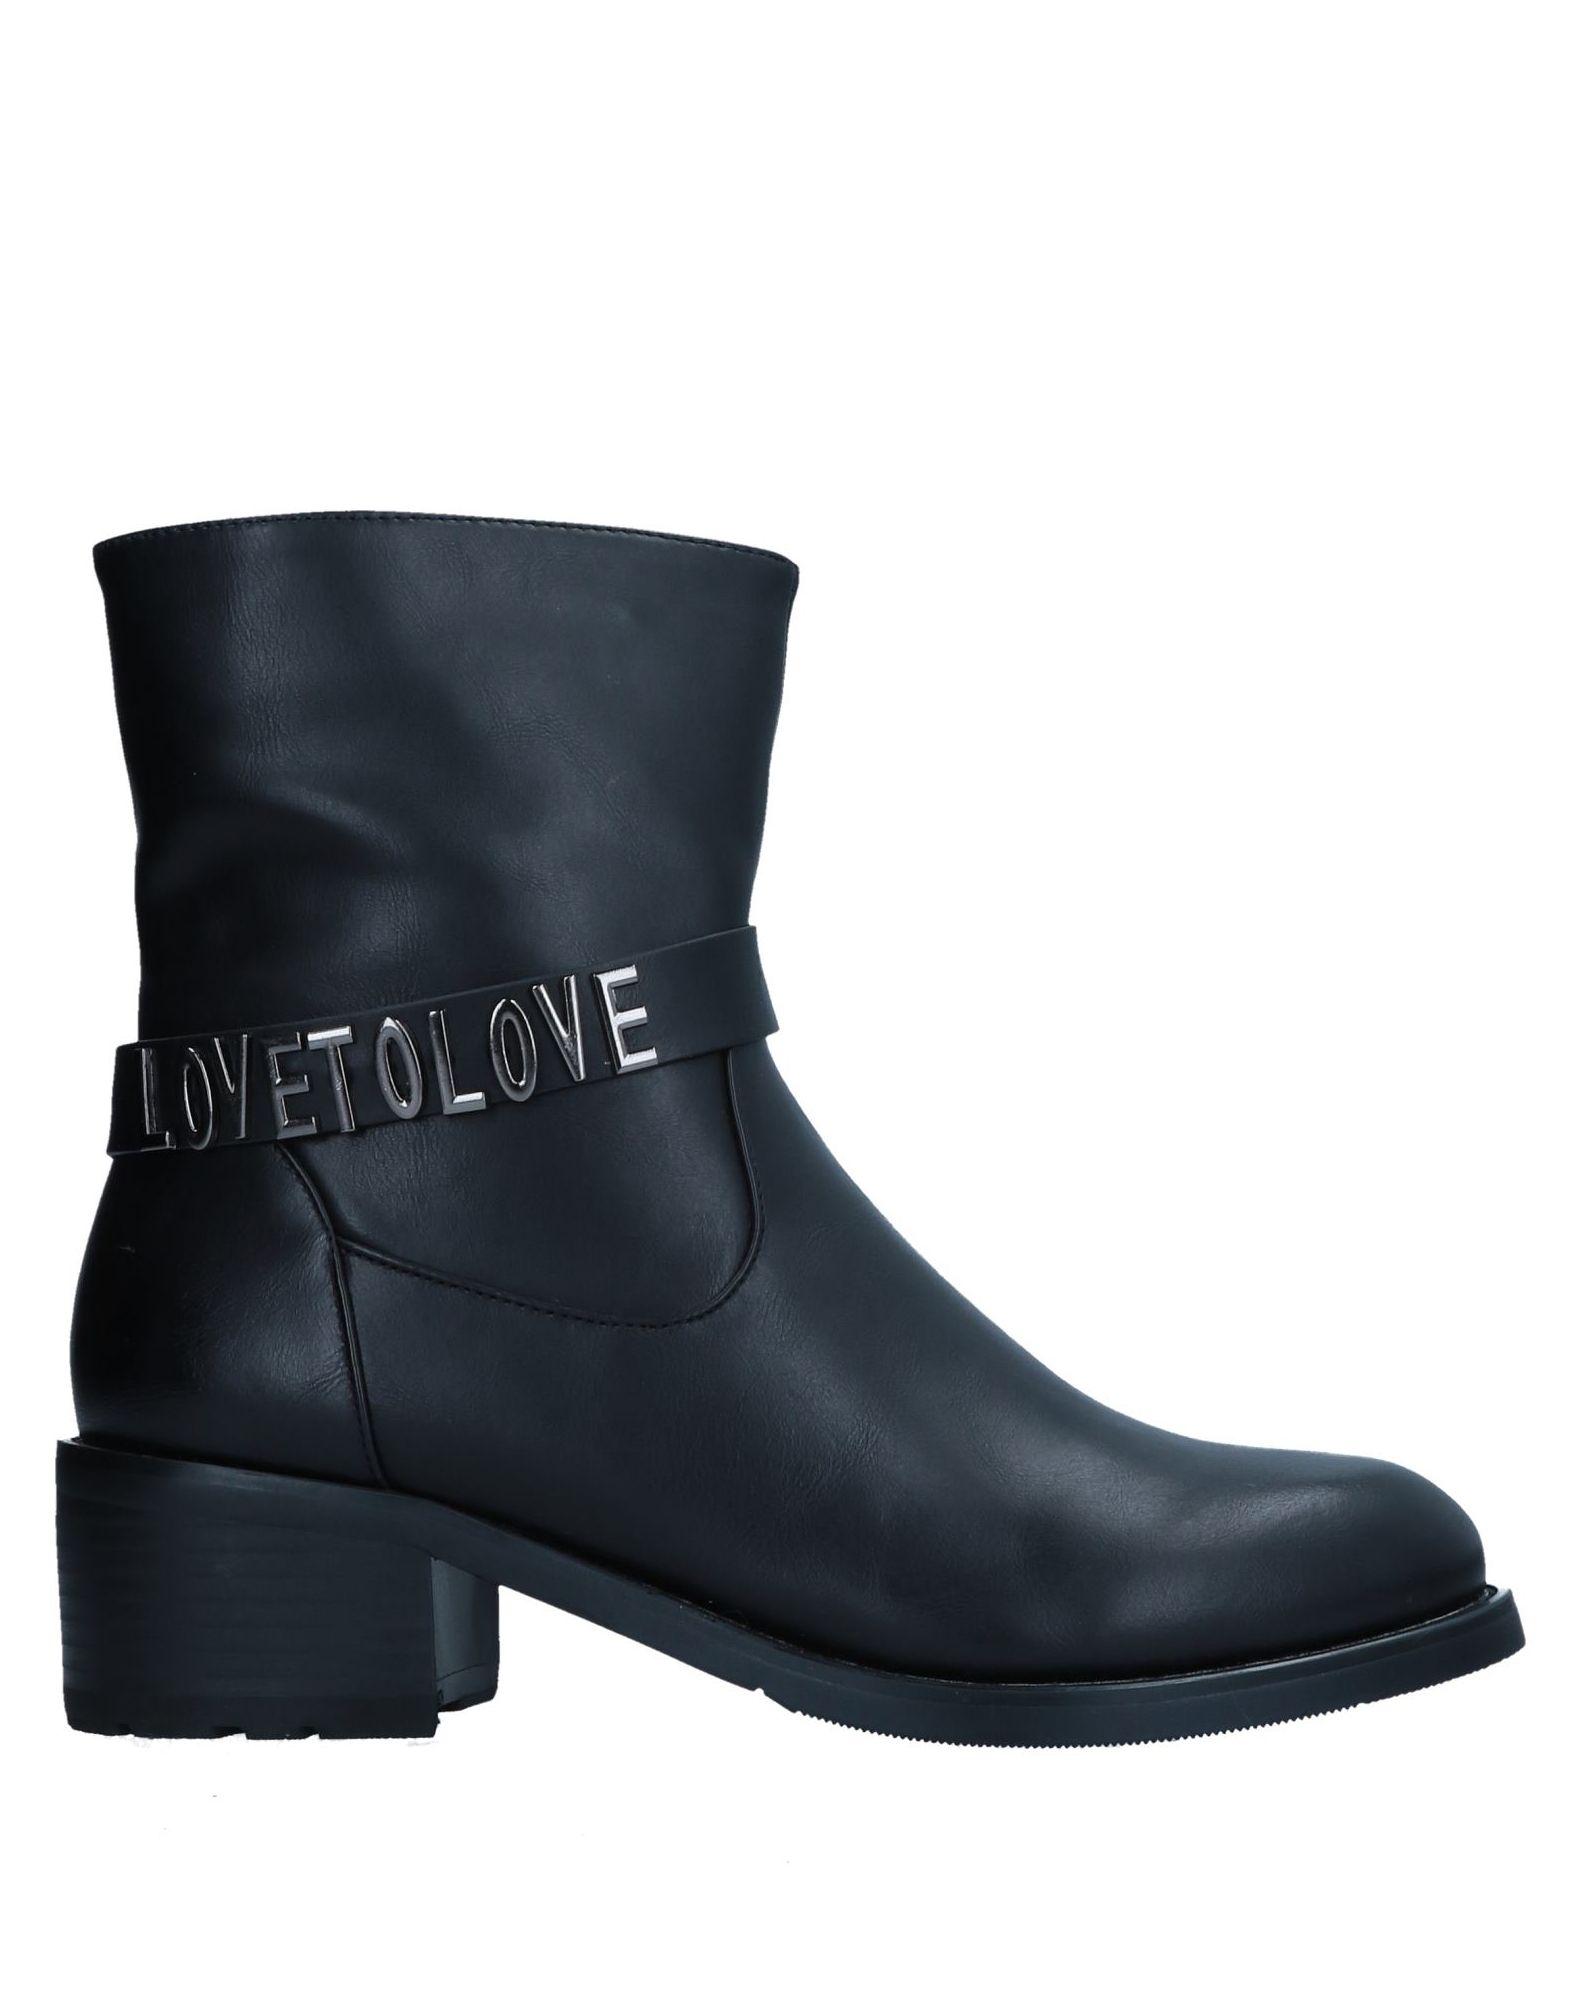 Gai Mattiolo Ankle Boot - Gai Women Gai - Mattiolo Ankle Boots online on  Canada - 11546747TC 3e6a9c